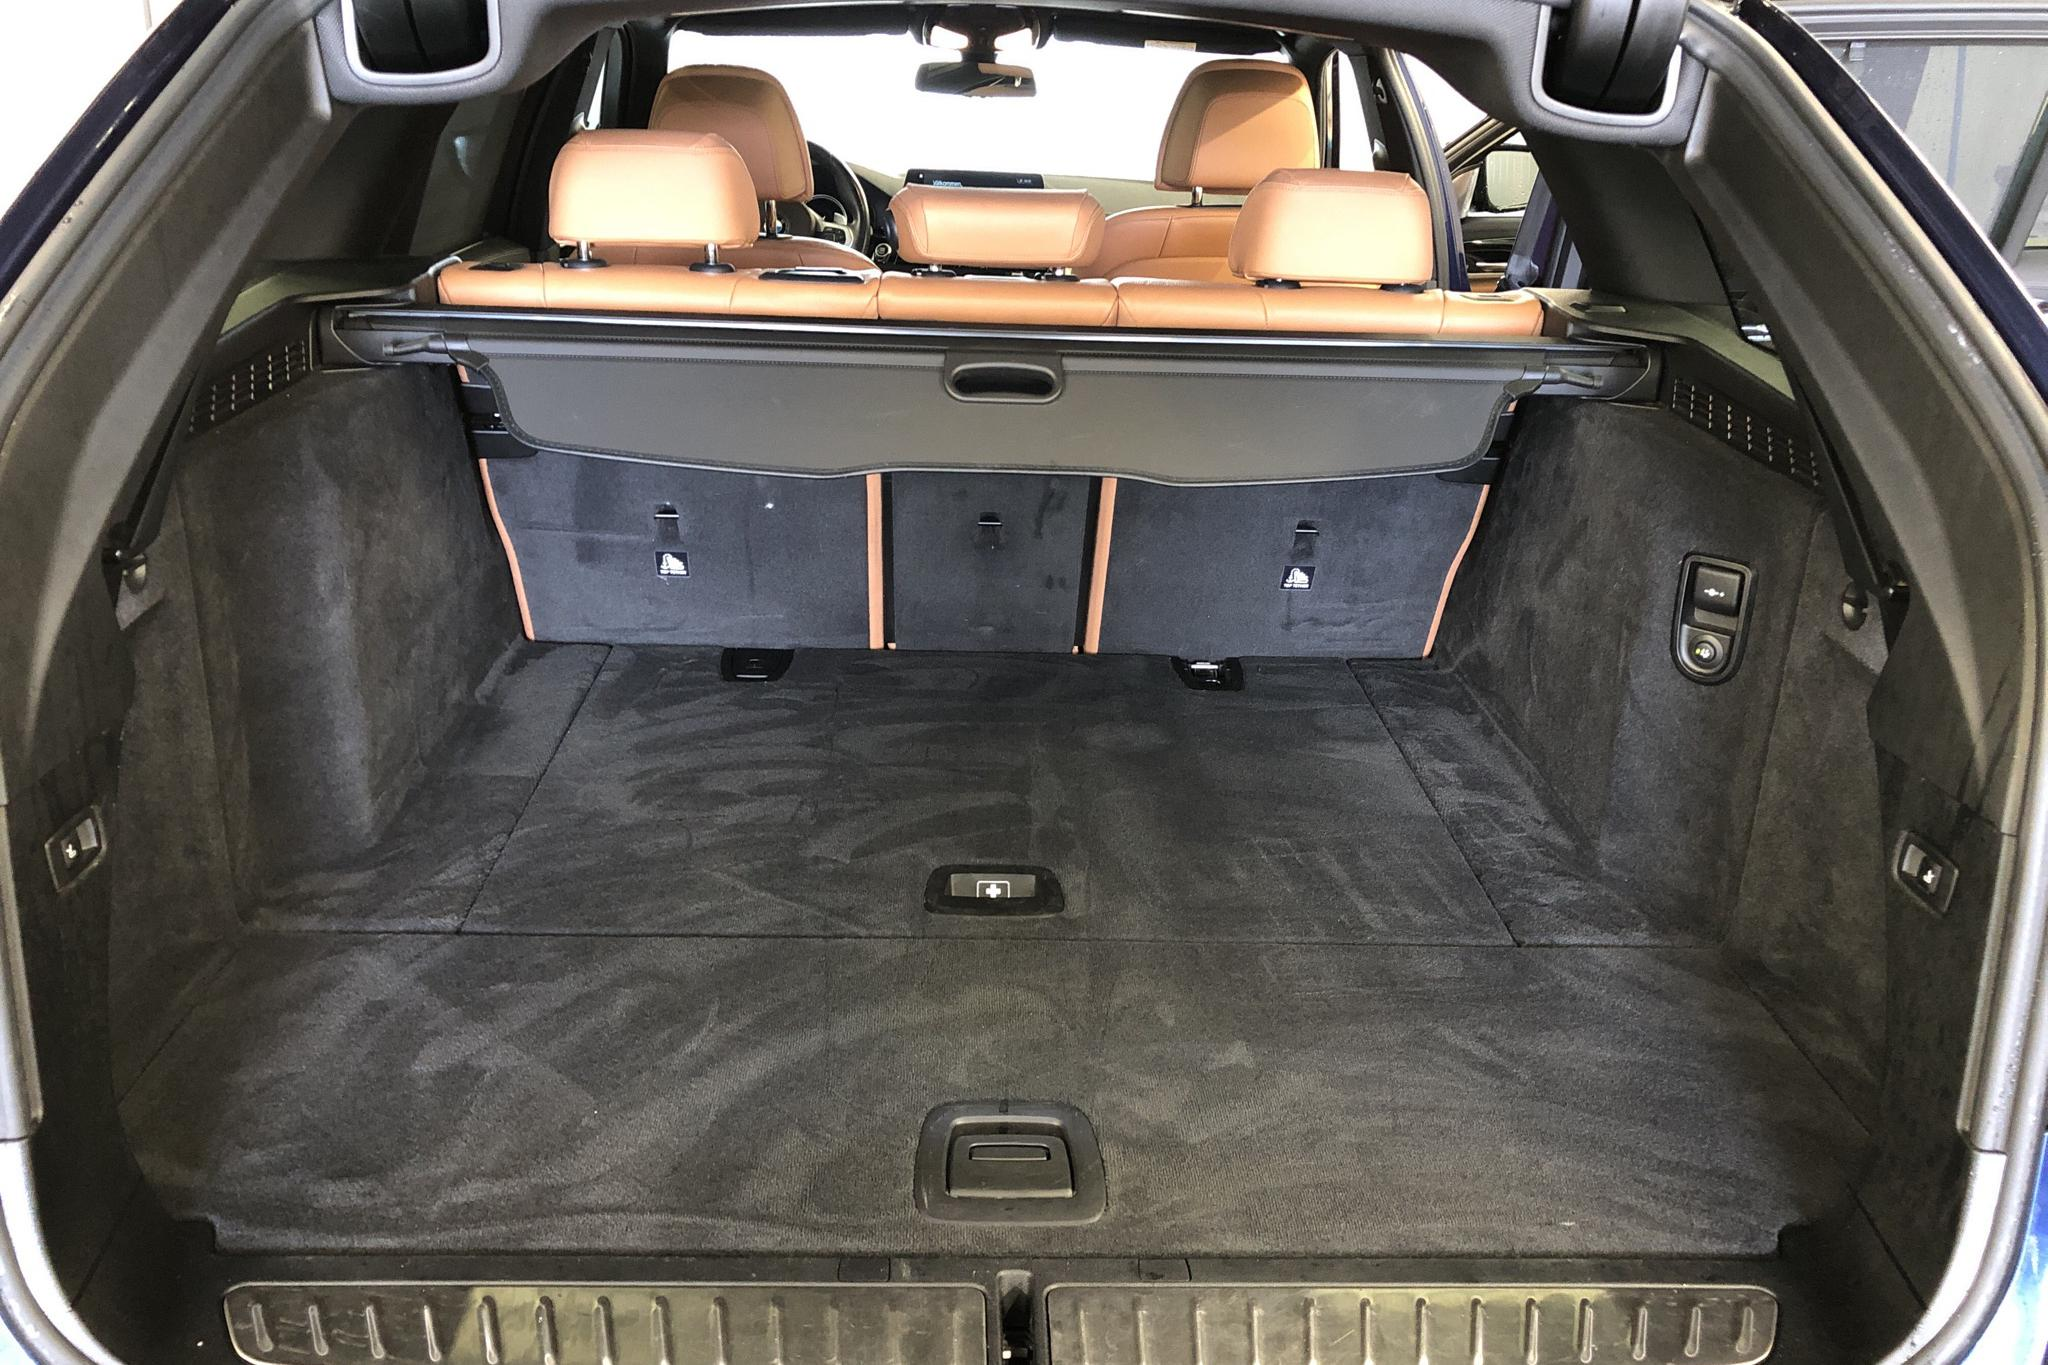 BMW 540i xDrive Touring, G31 (340hk) - 111 730 km - Automatic - blue - 2018